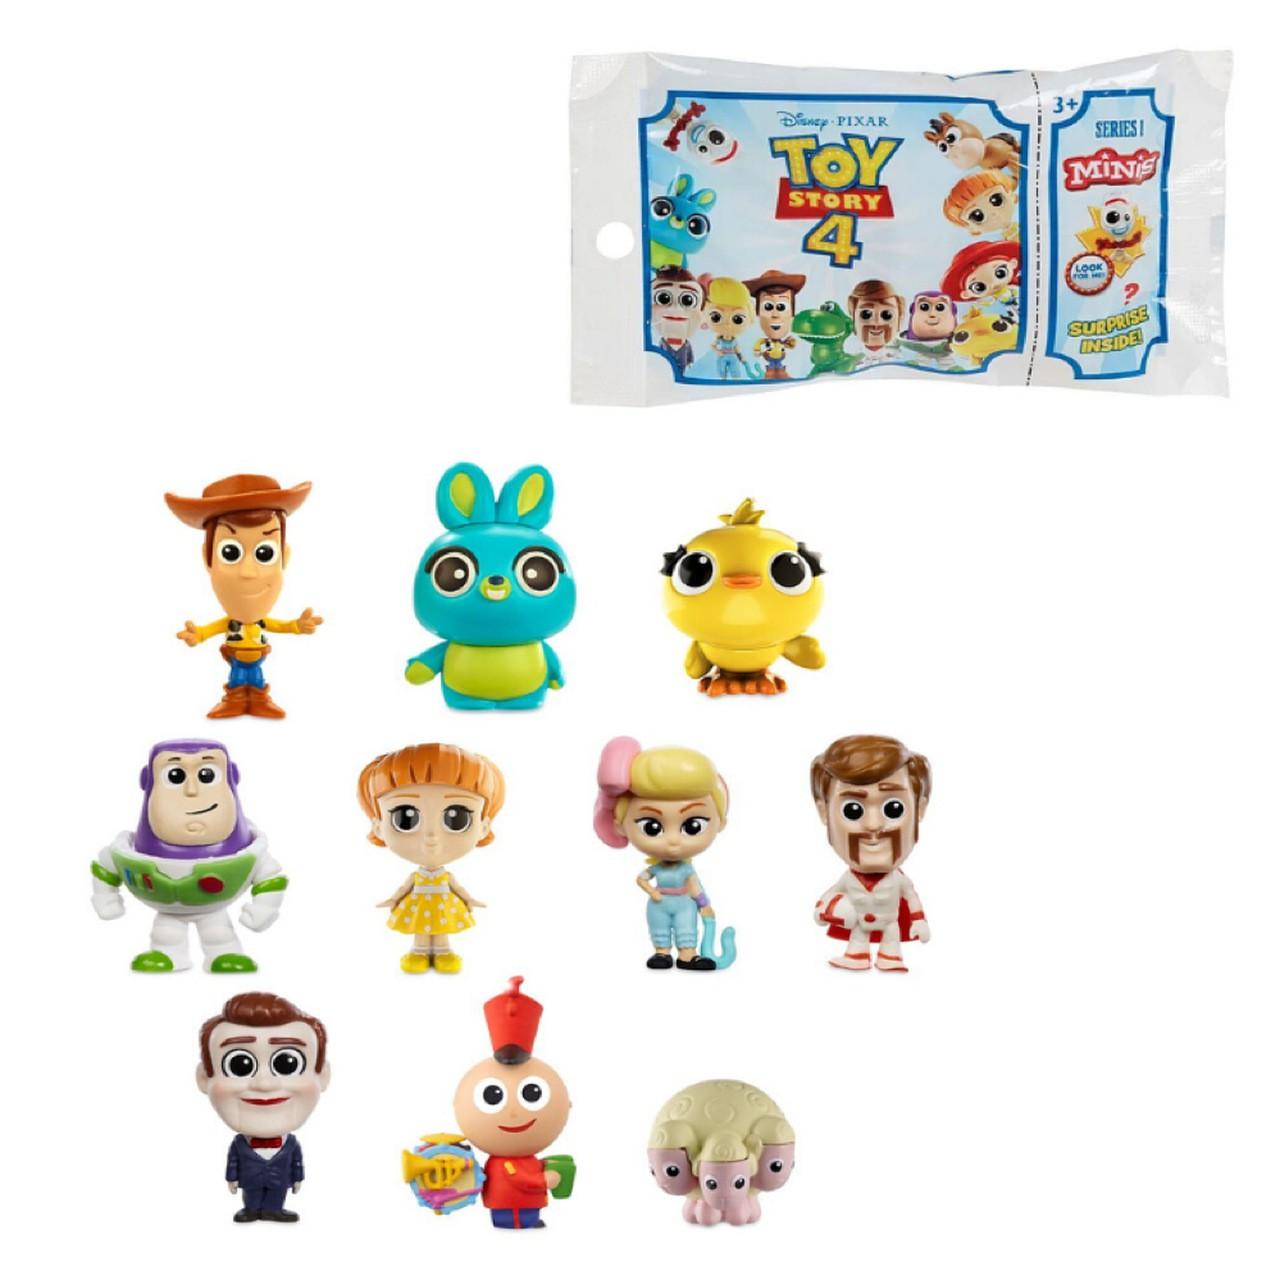 Toy Story 4 - Kit com 5 Mini Figura Surpresa - Mattel